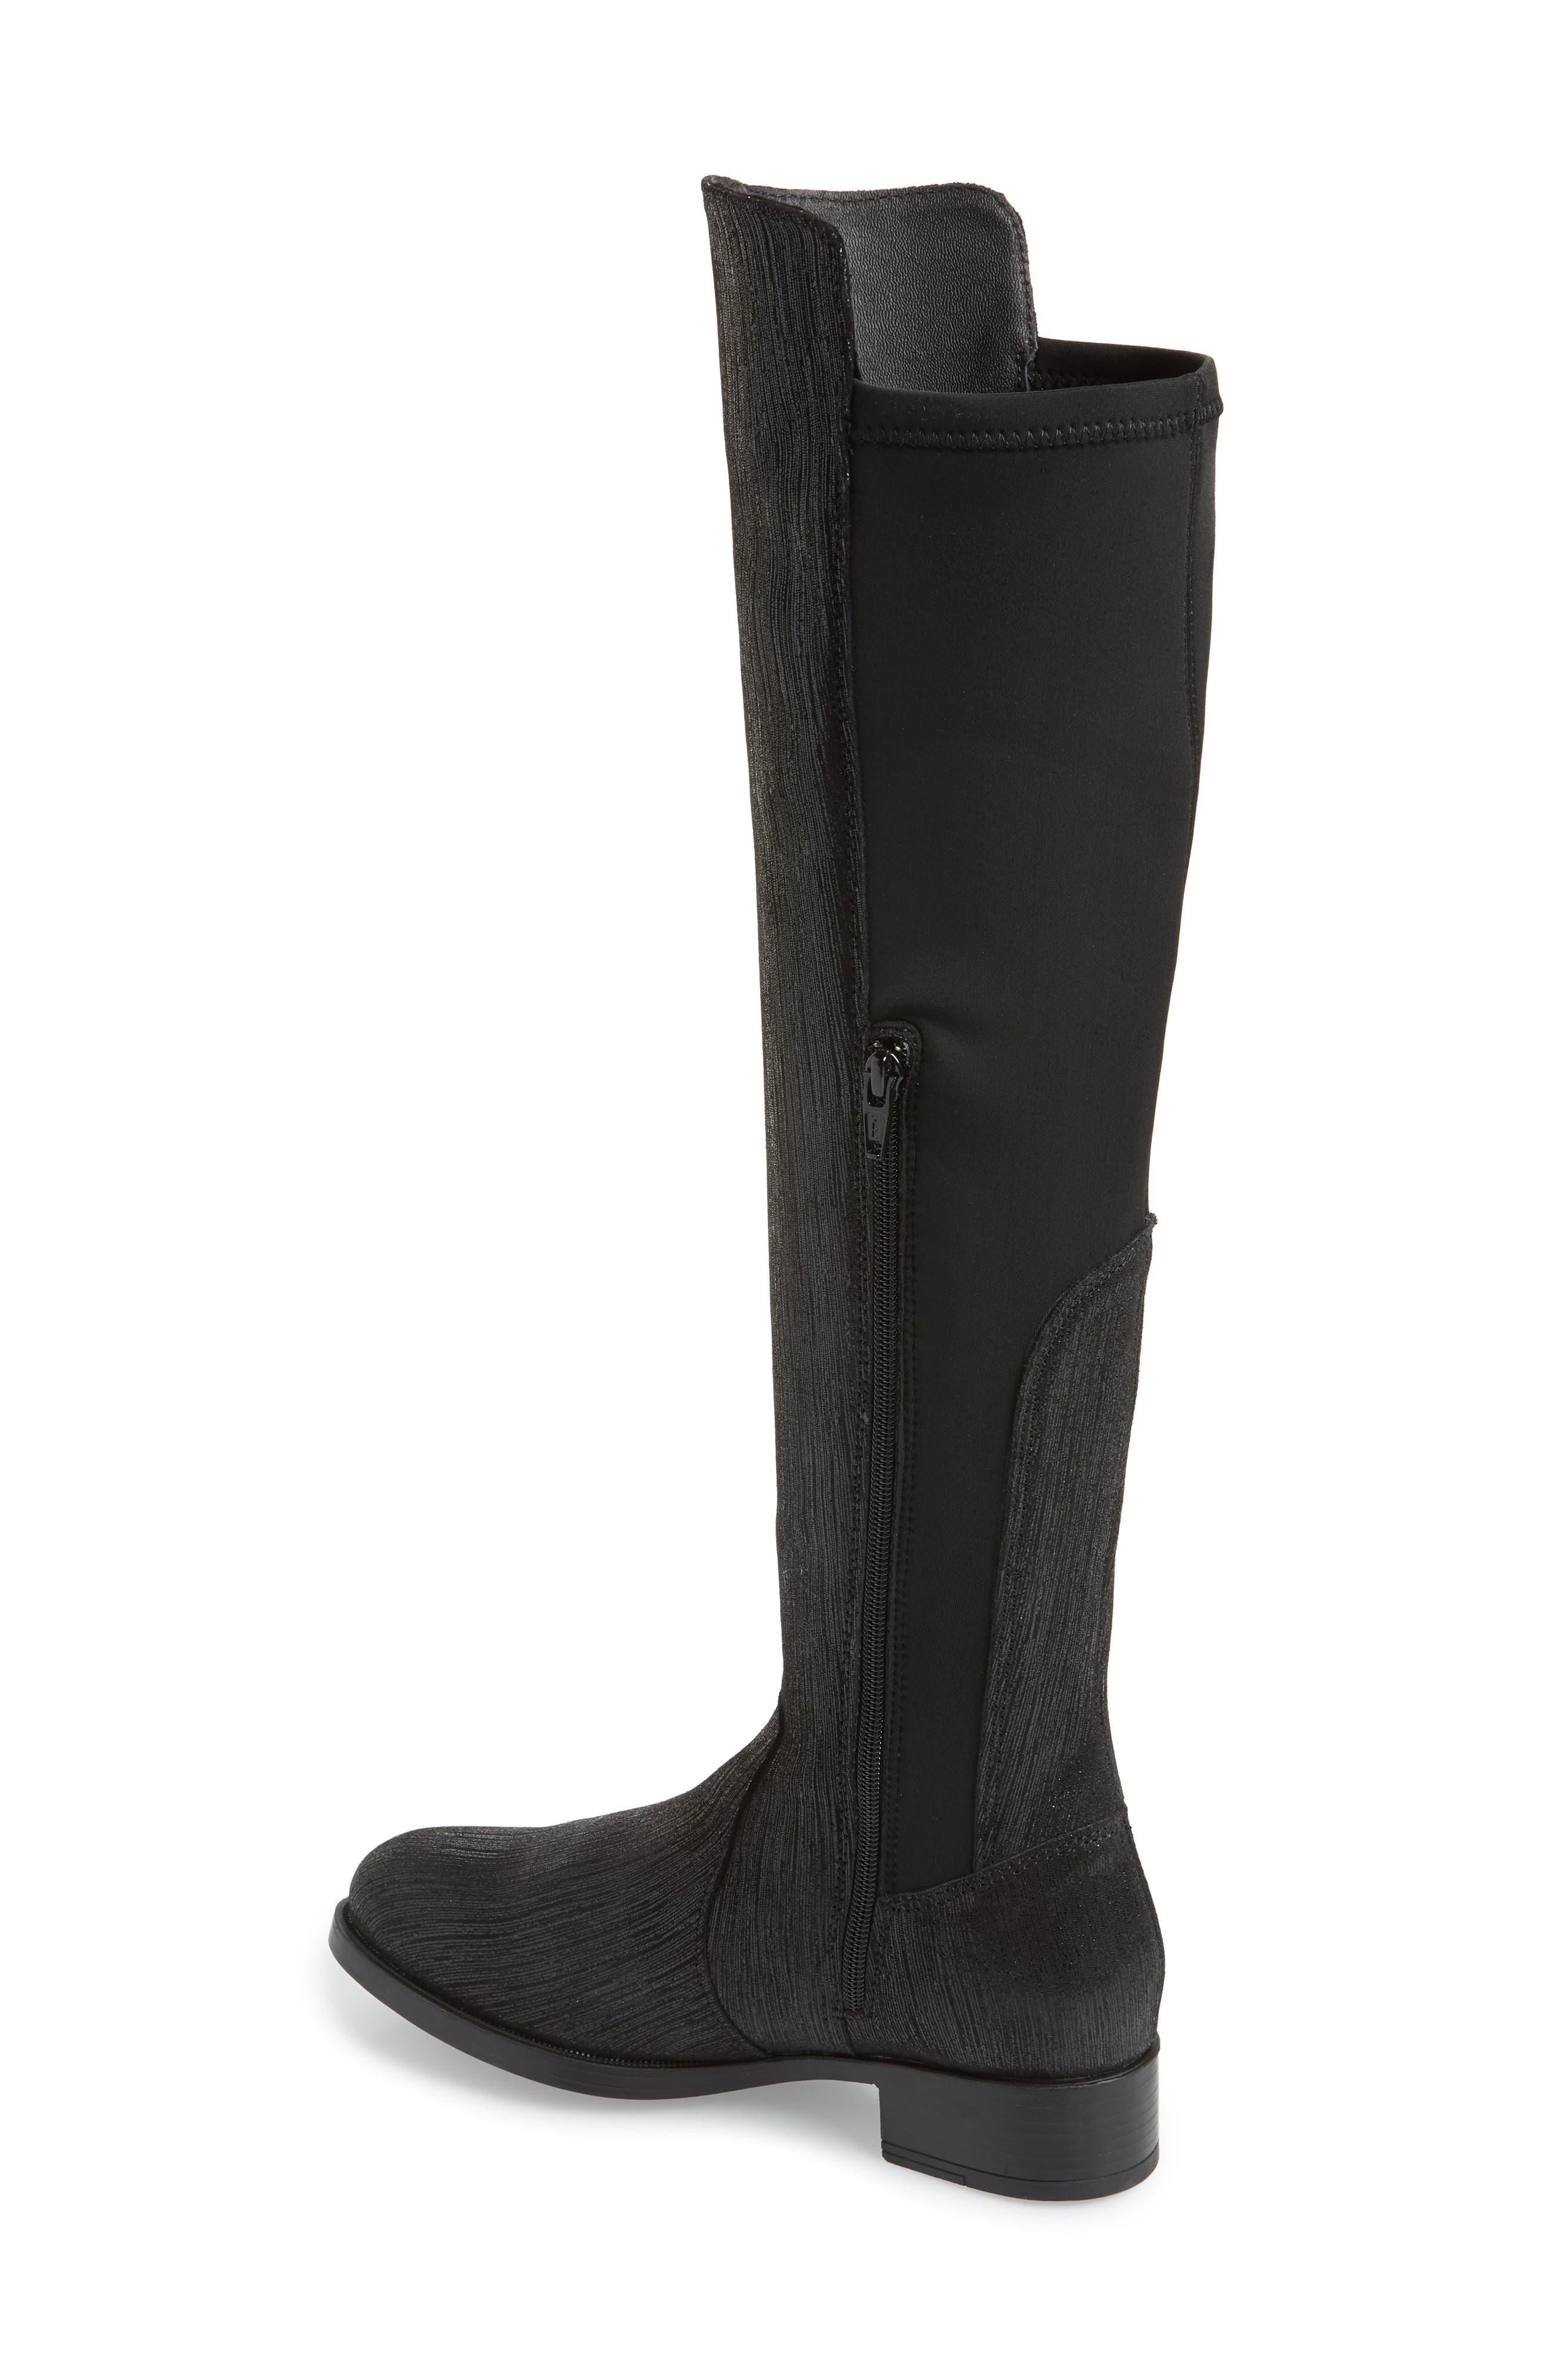 Bunt Waterproof Over the Knee Boot,                             Alternate thumbnail 2, color,                             Black Metal/ Lycra